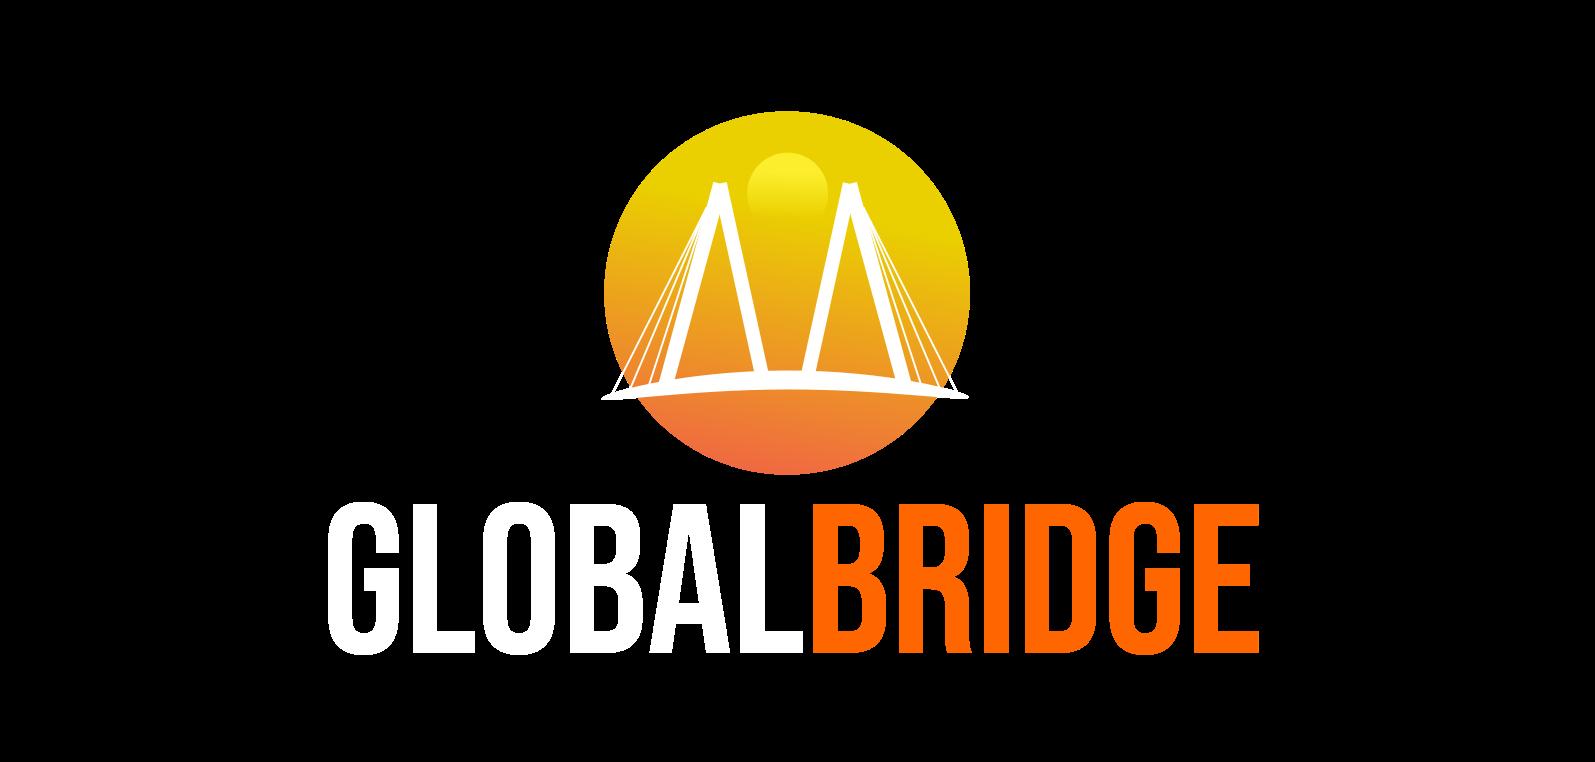 GlobalBridge - Profesjonalny import z Chin